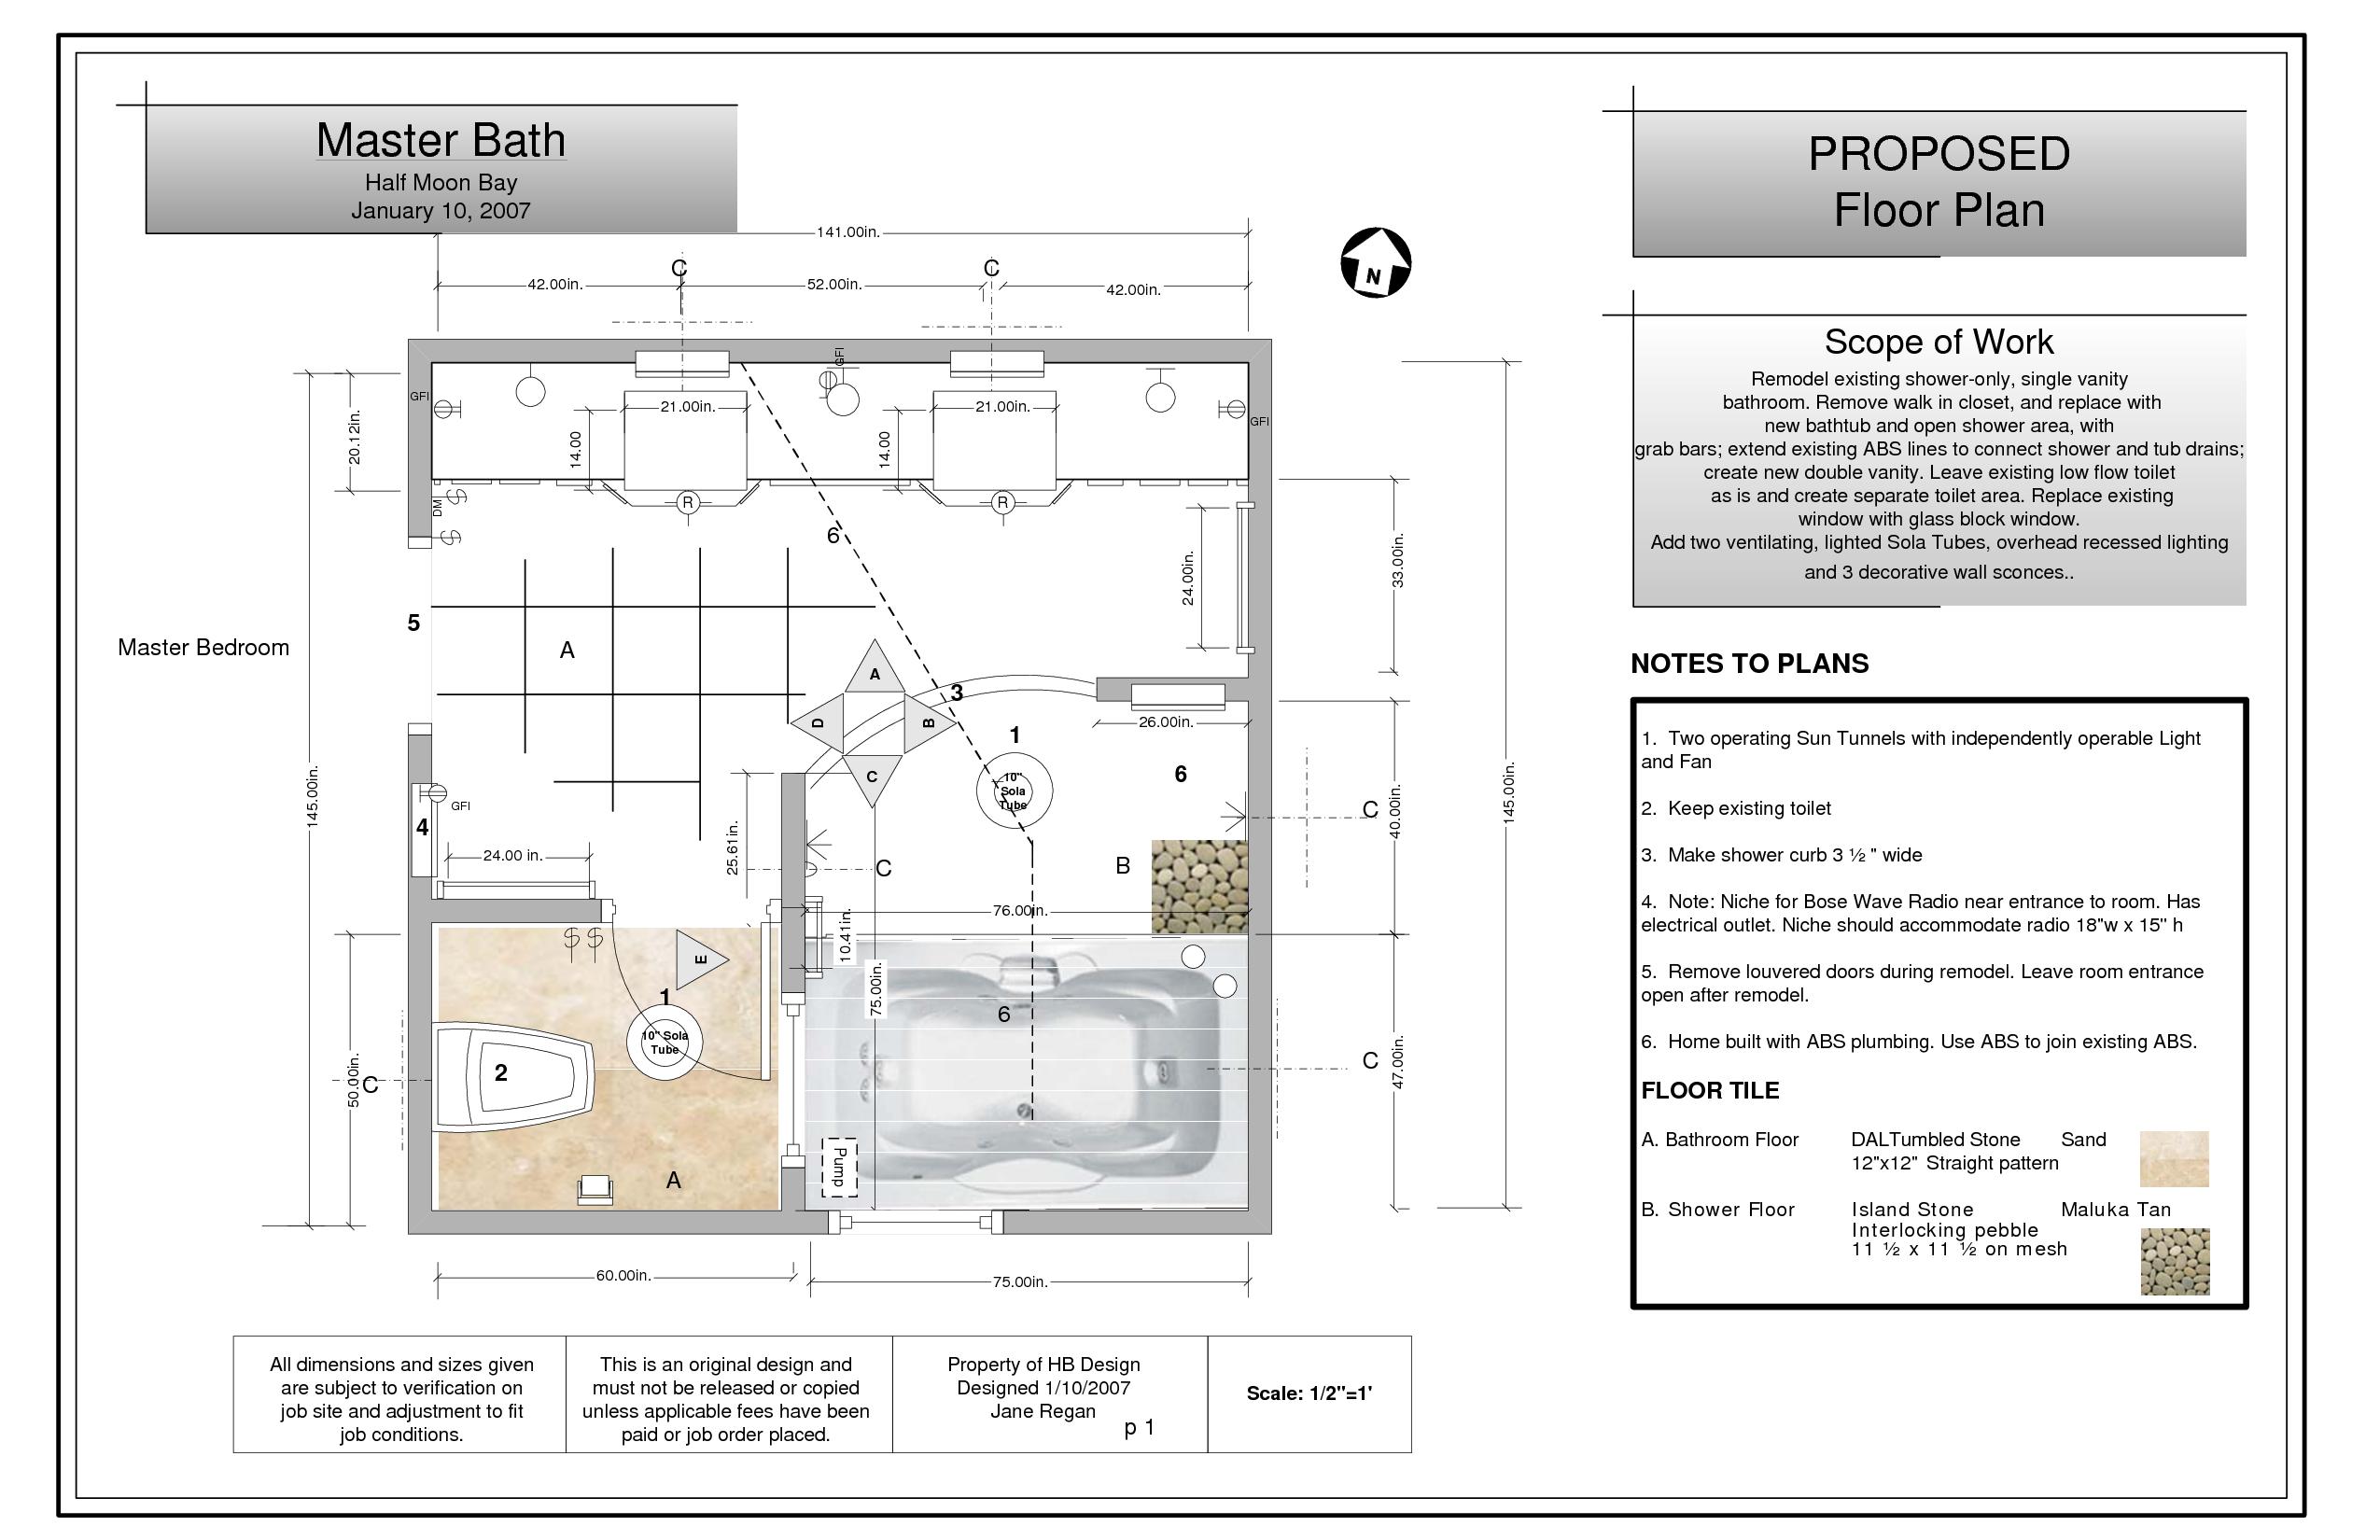 Photo Gallery For Website Master Bathroom Floor Plans With Walk In Shower Master Bath Floor Plans with Walk In Shower bathroom floor plans Living Room